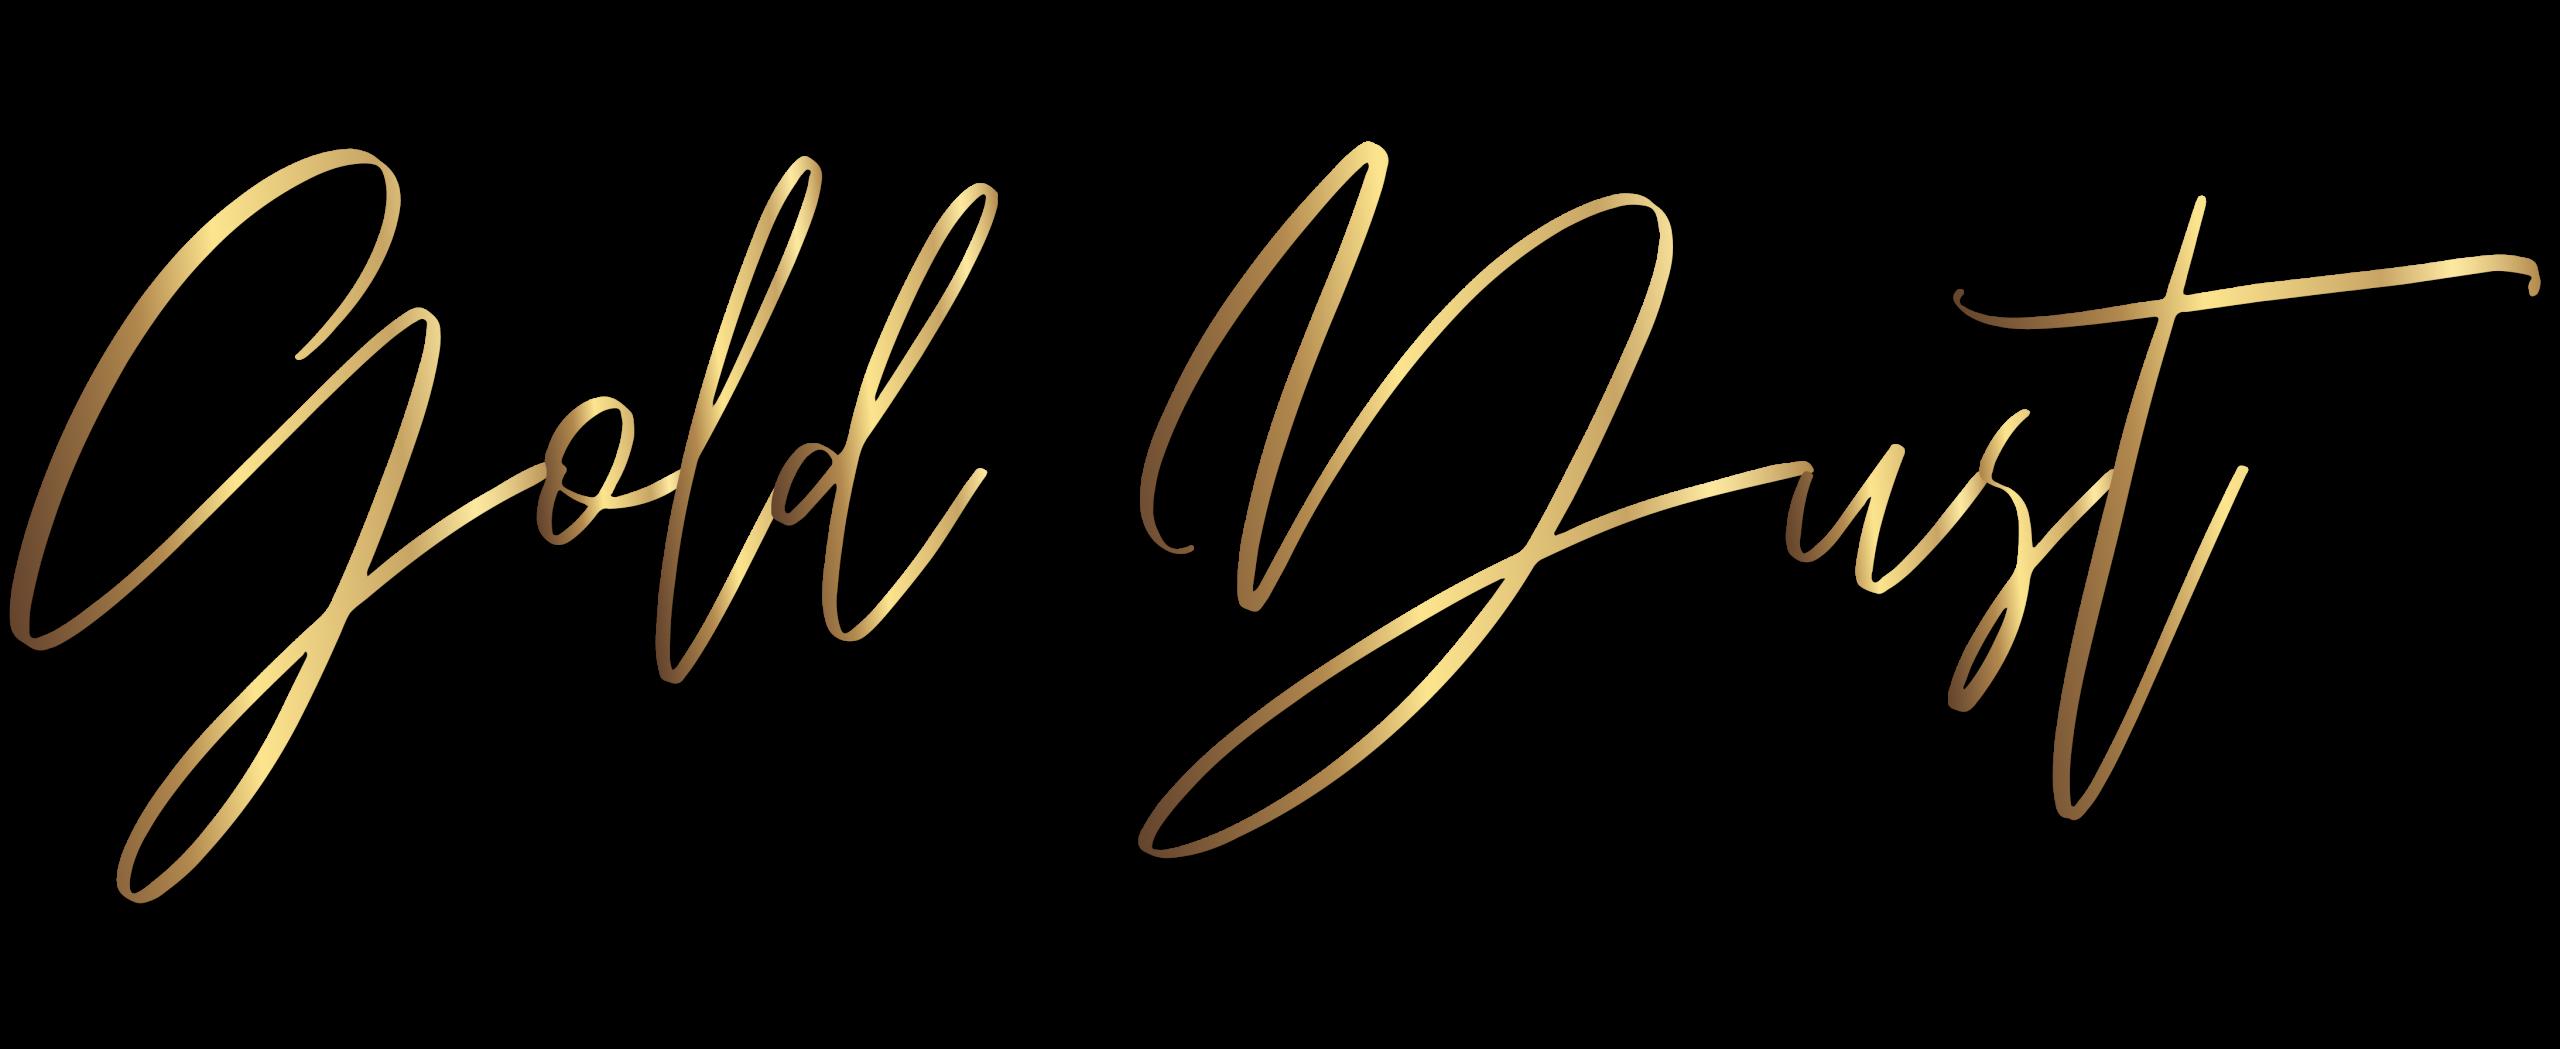 Gold Dust - Blog